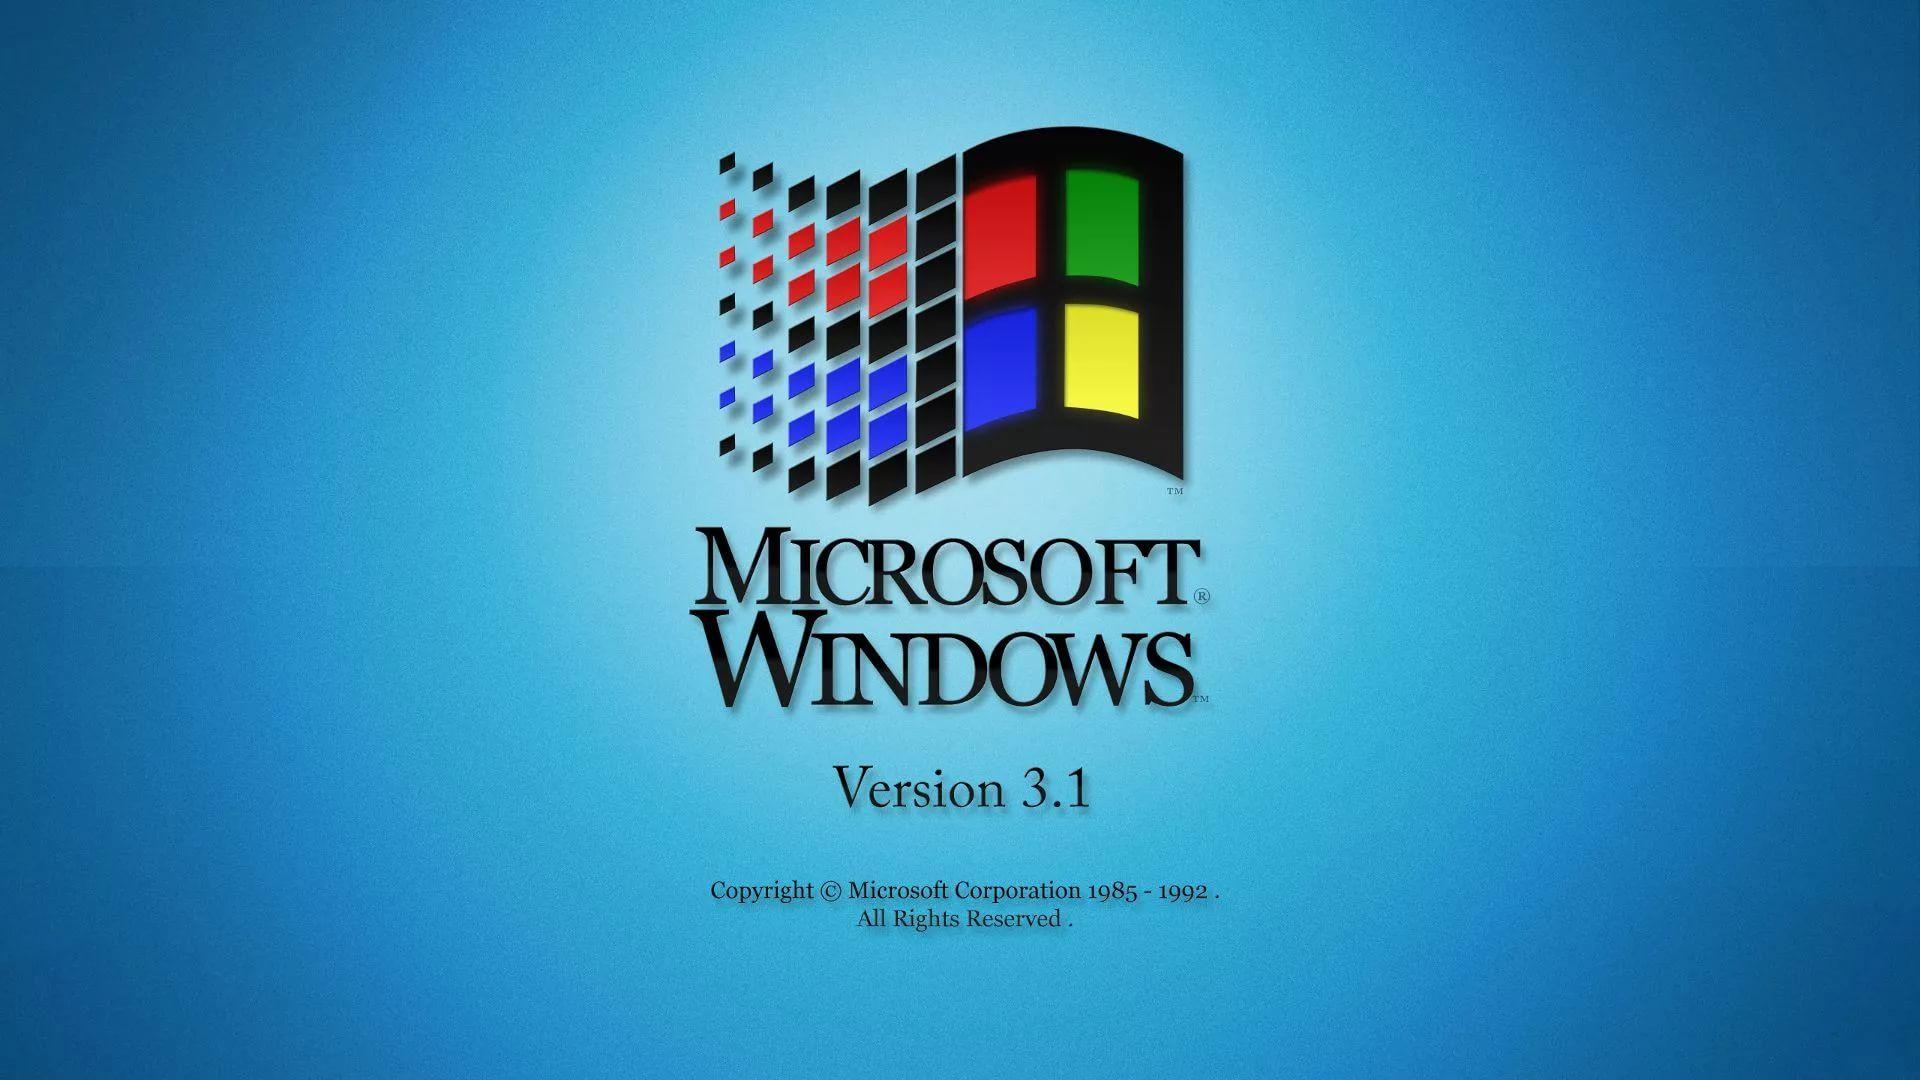 Windows Wallpaper Image